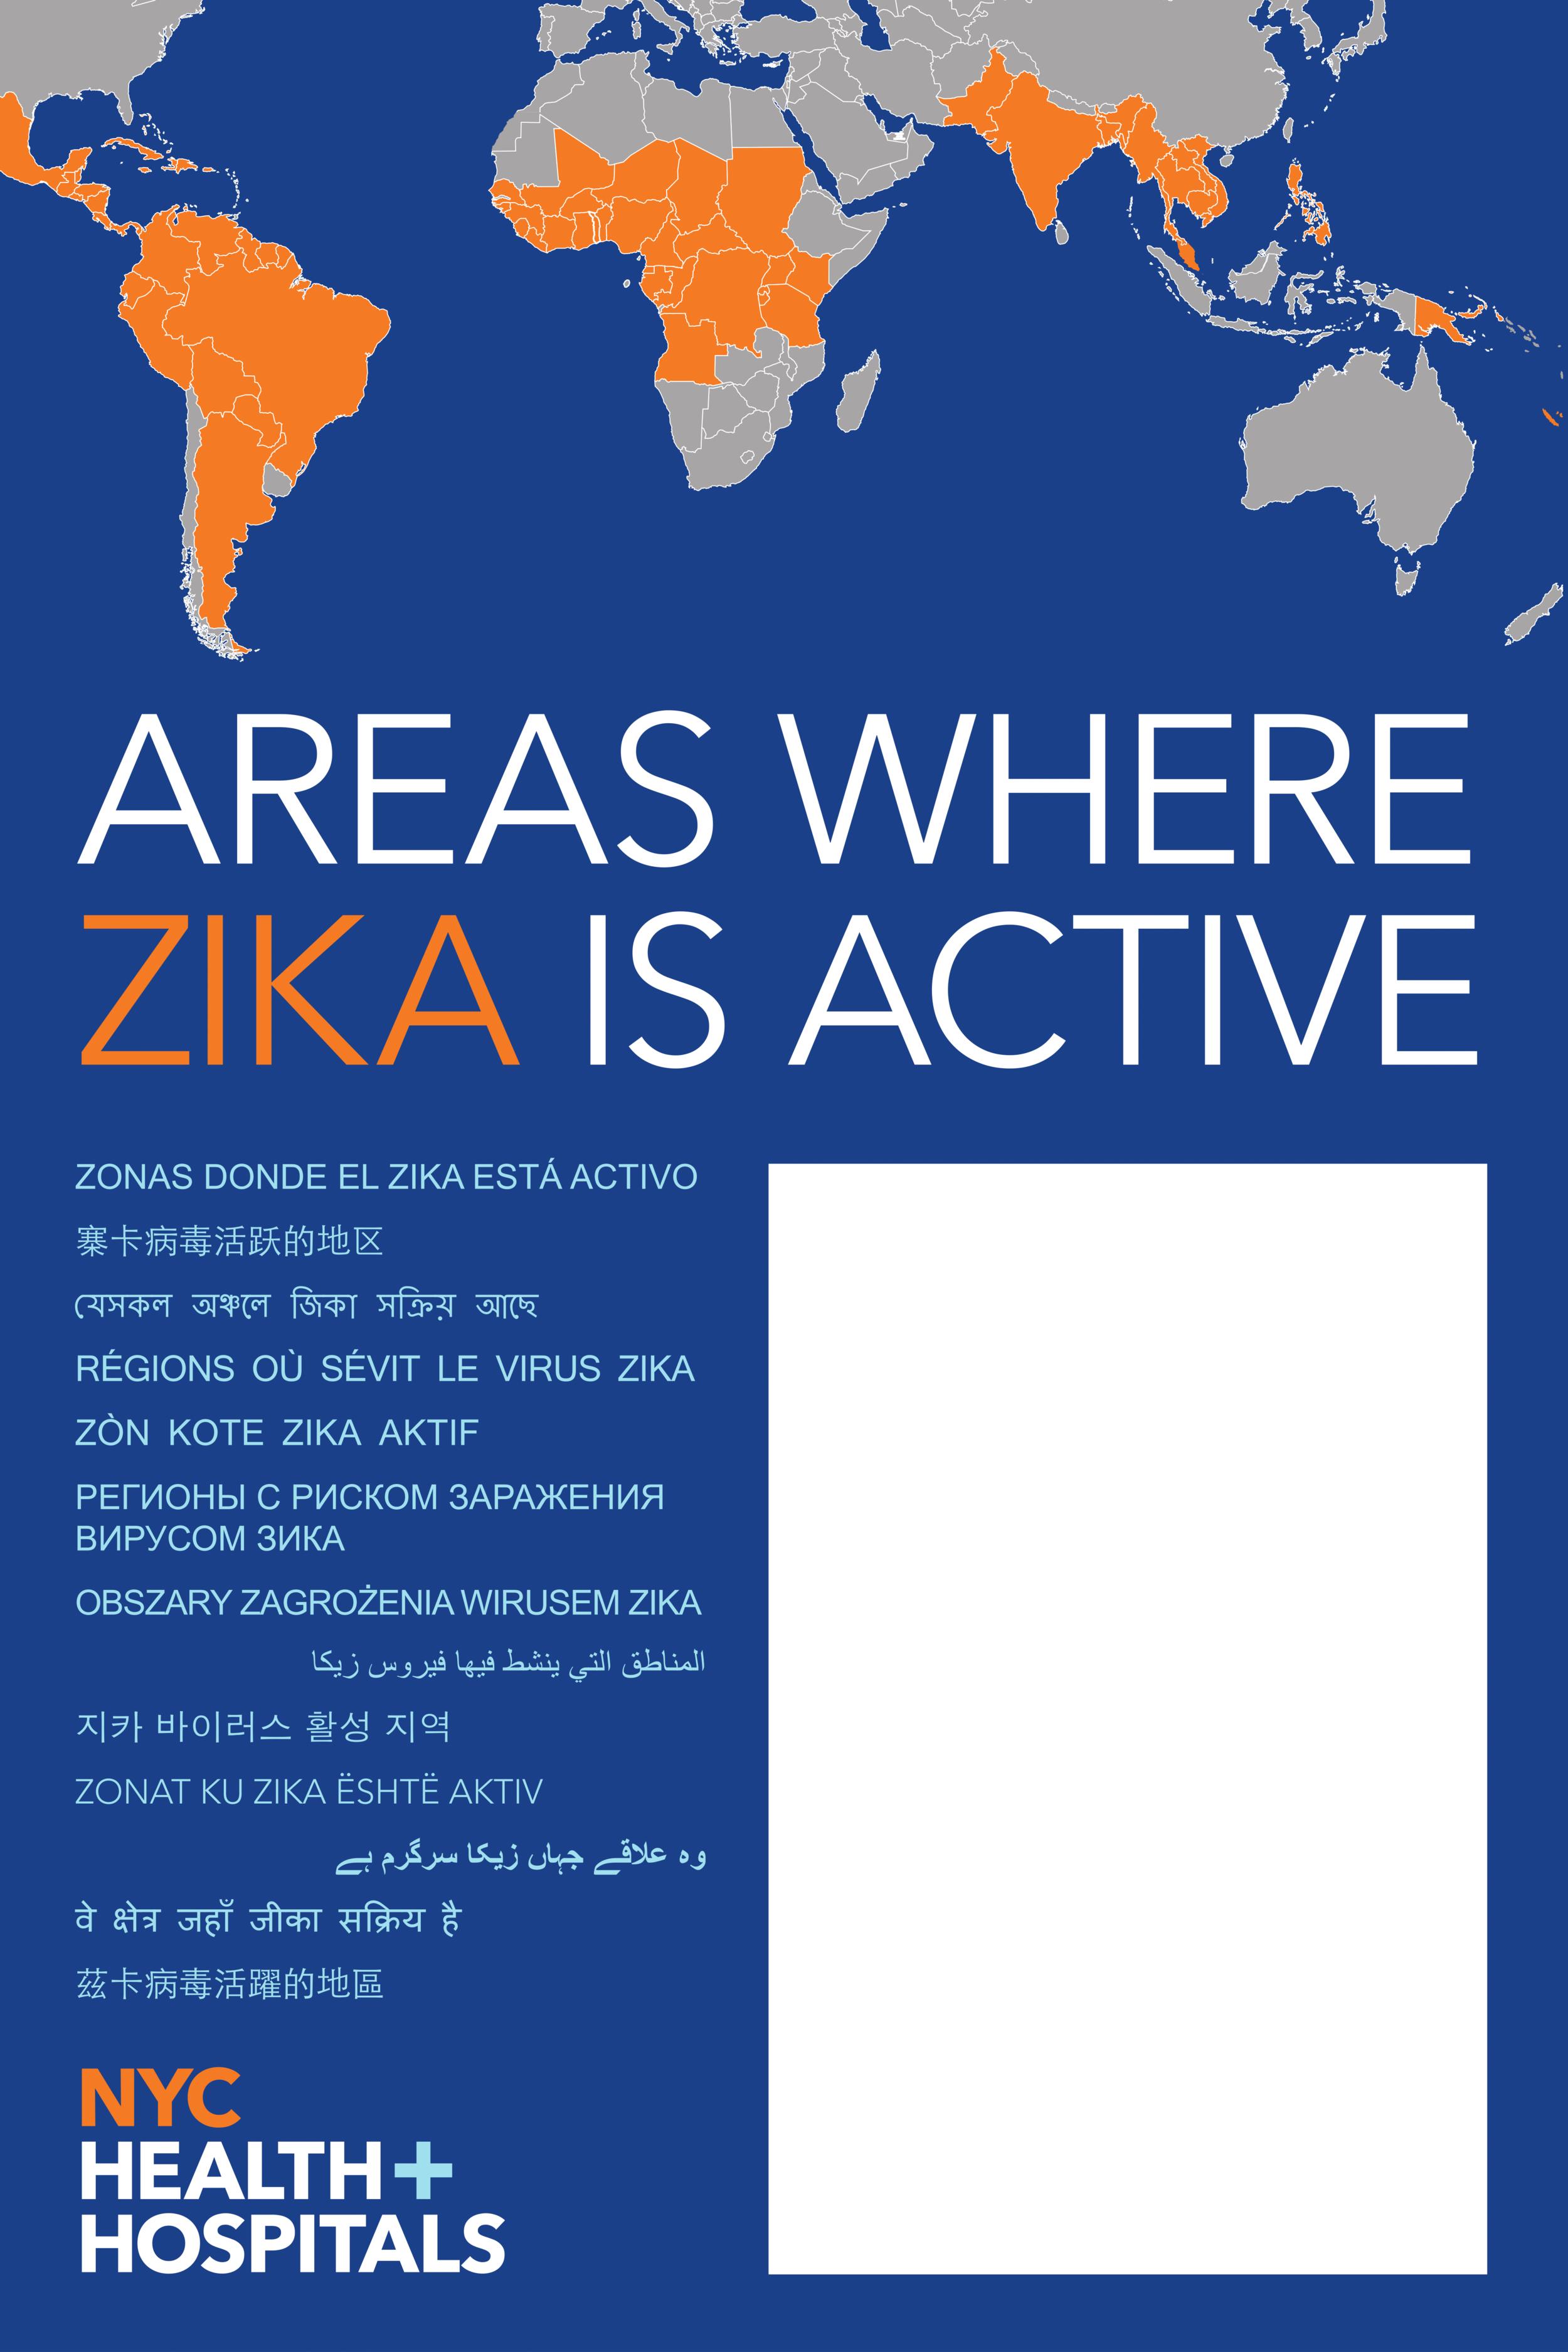 ZikaPosterMap_Translated_2-1.png